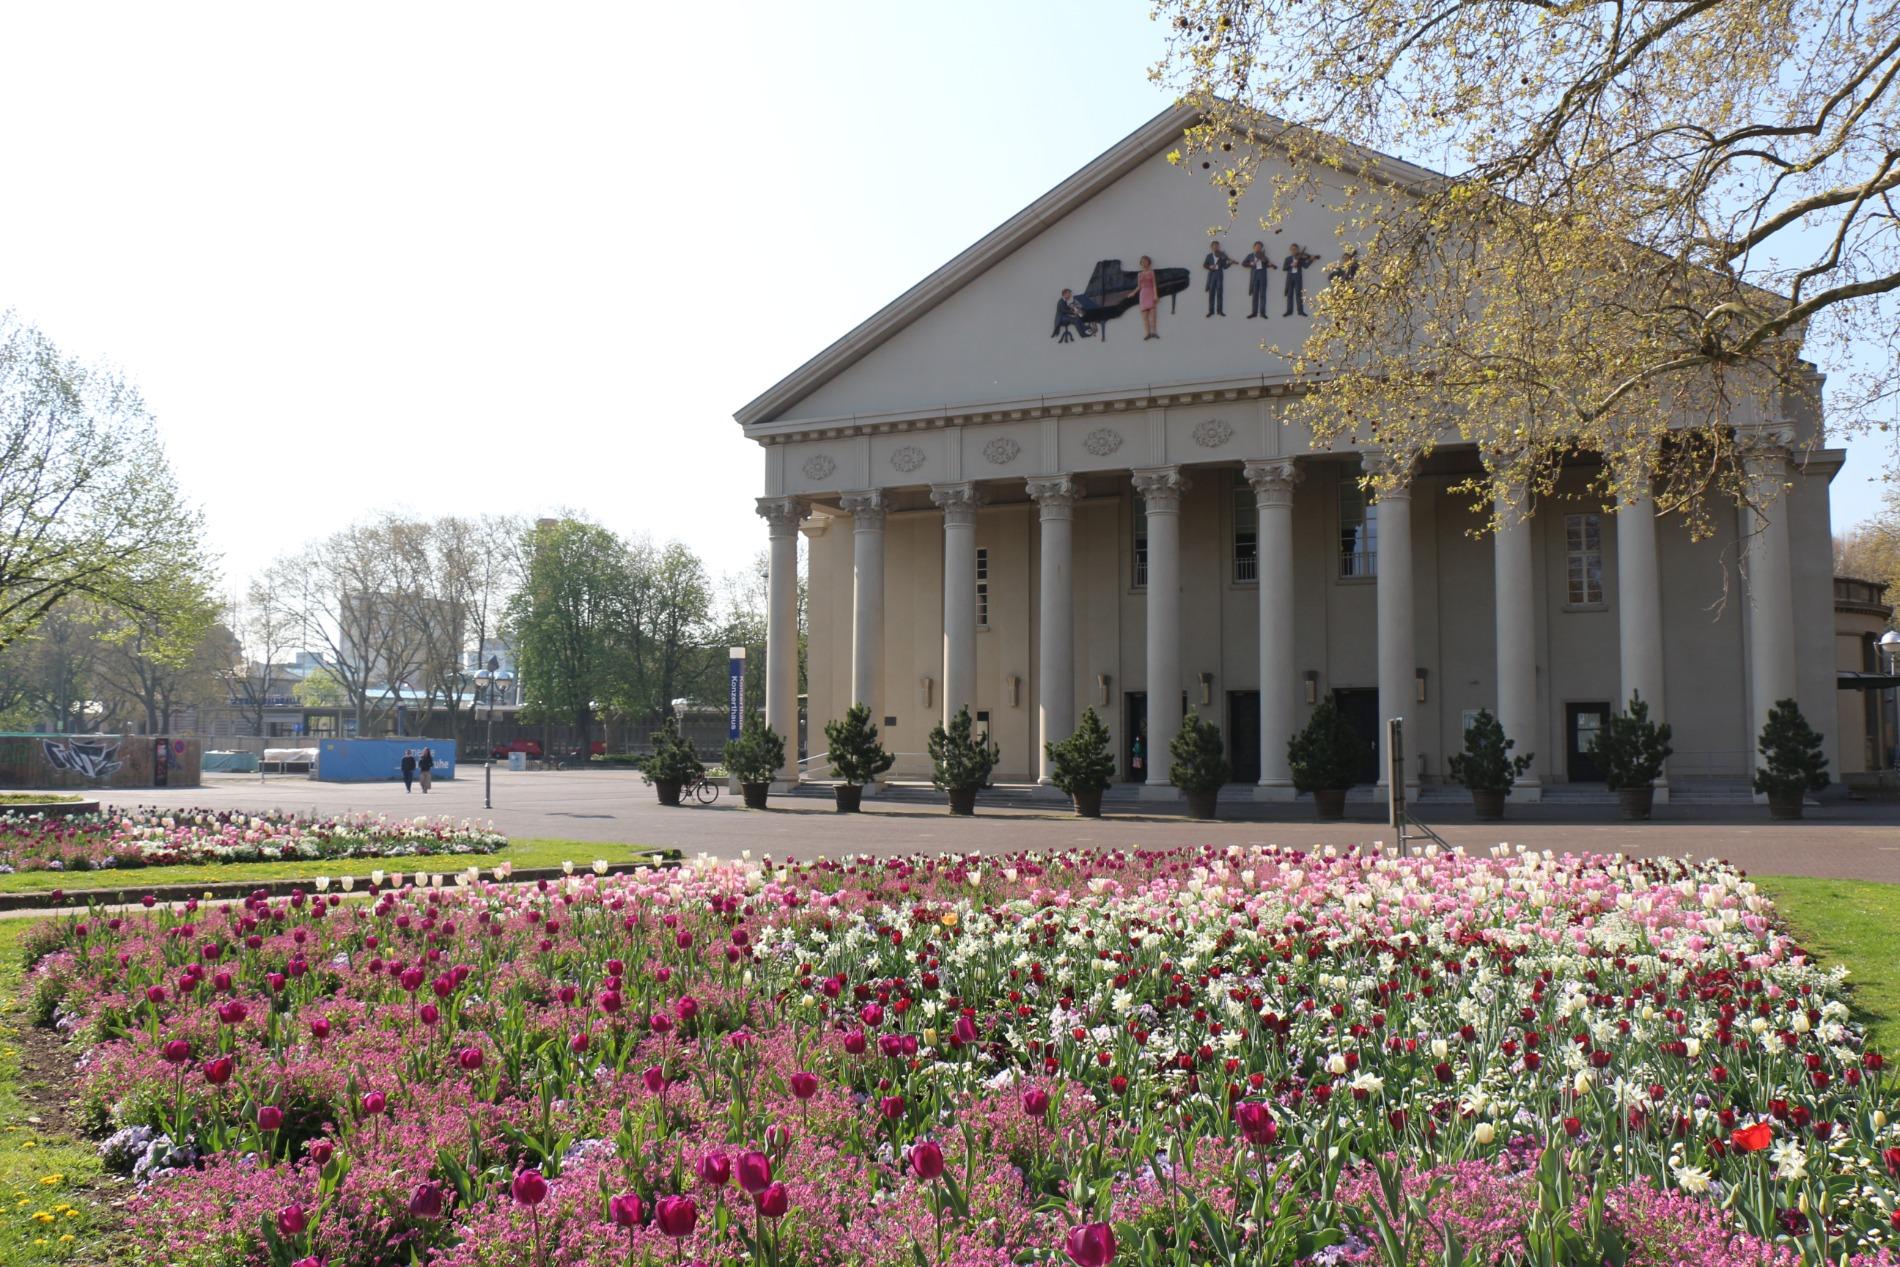 Das Konzerthaus in Karlsruhe